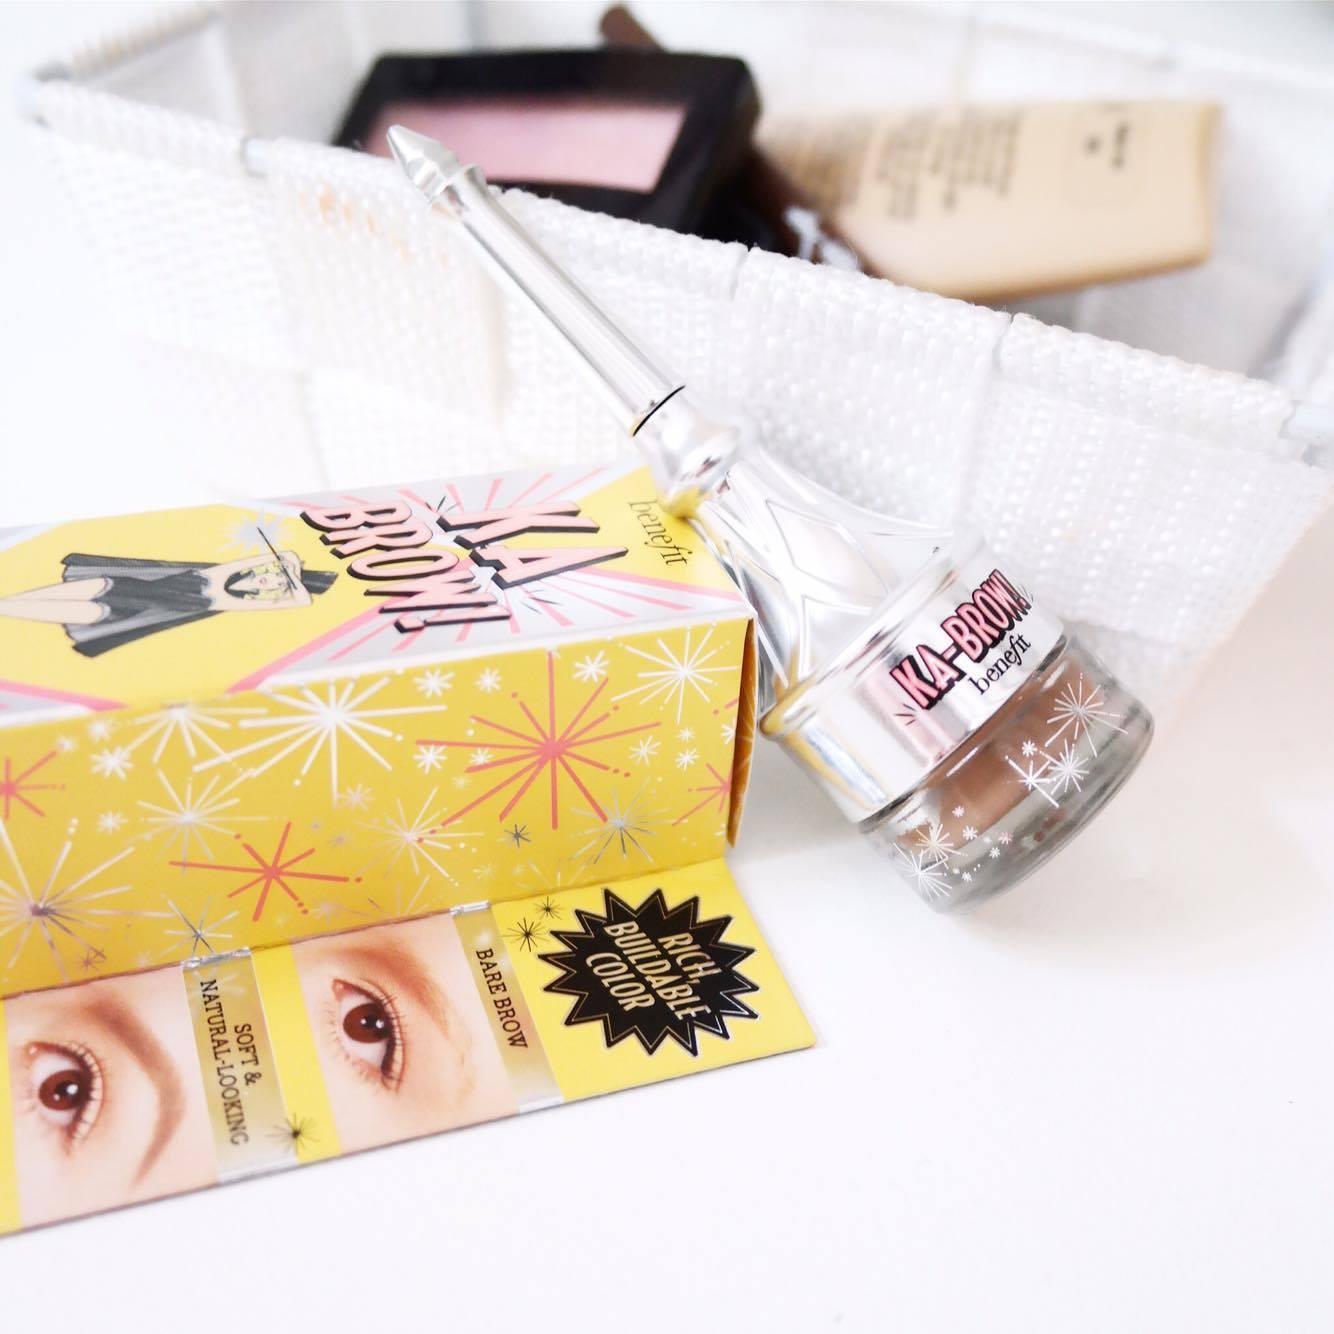 ka-brow-benefit-cosmetic